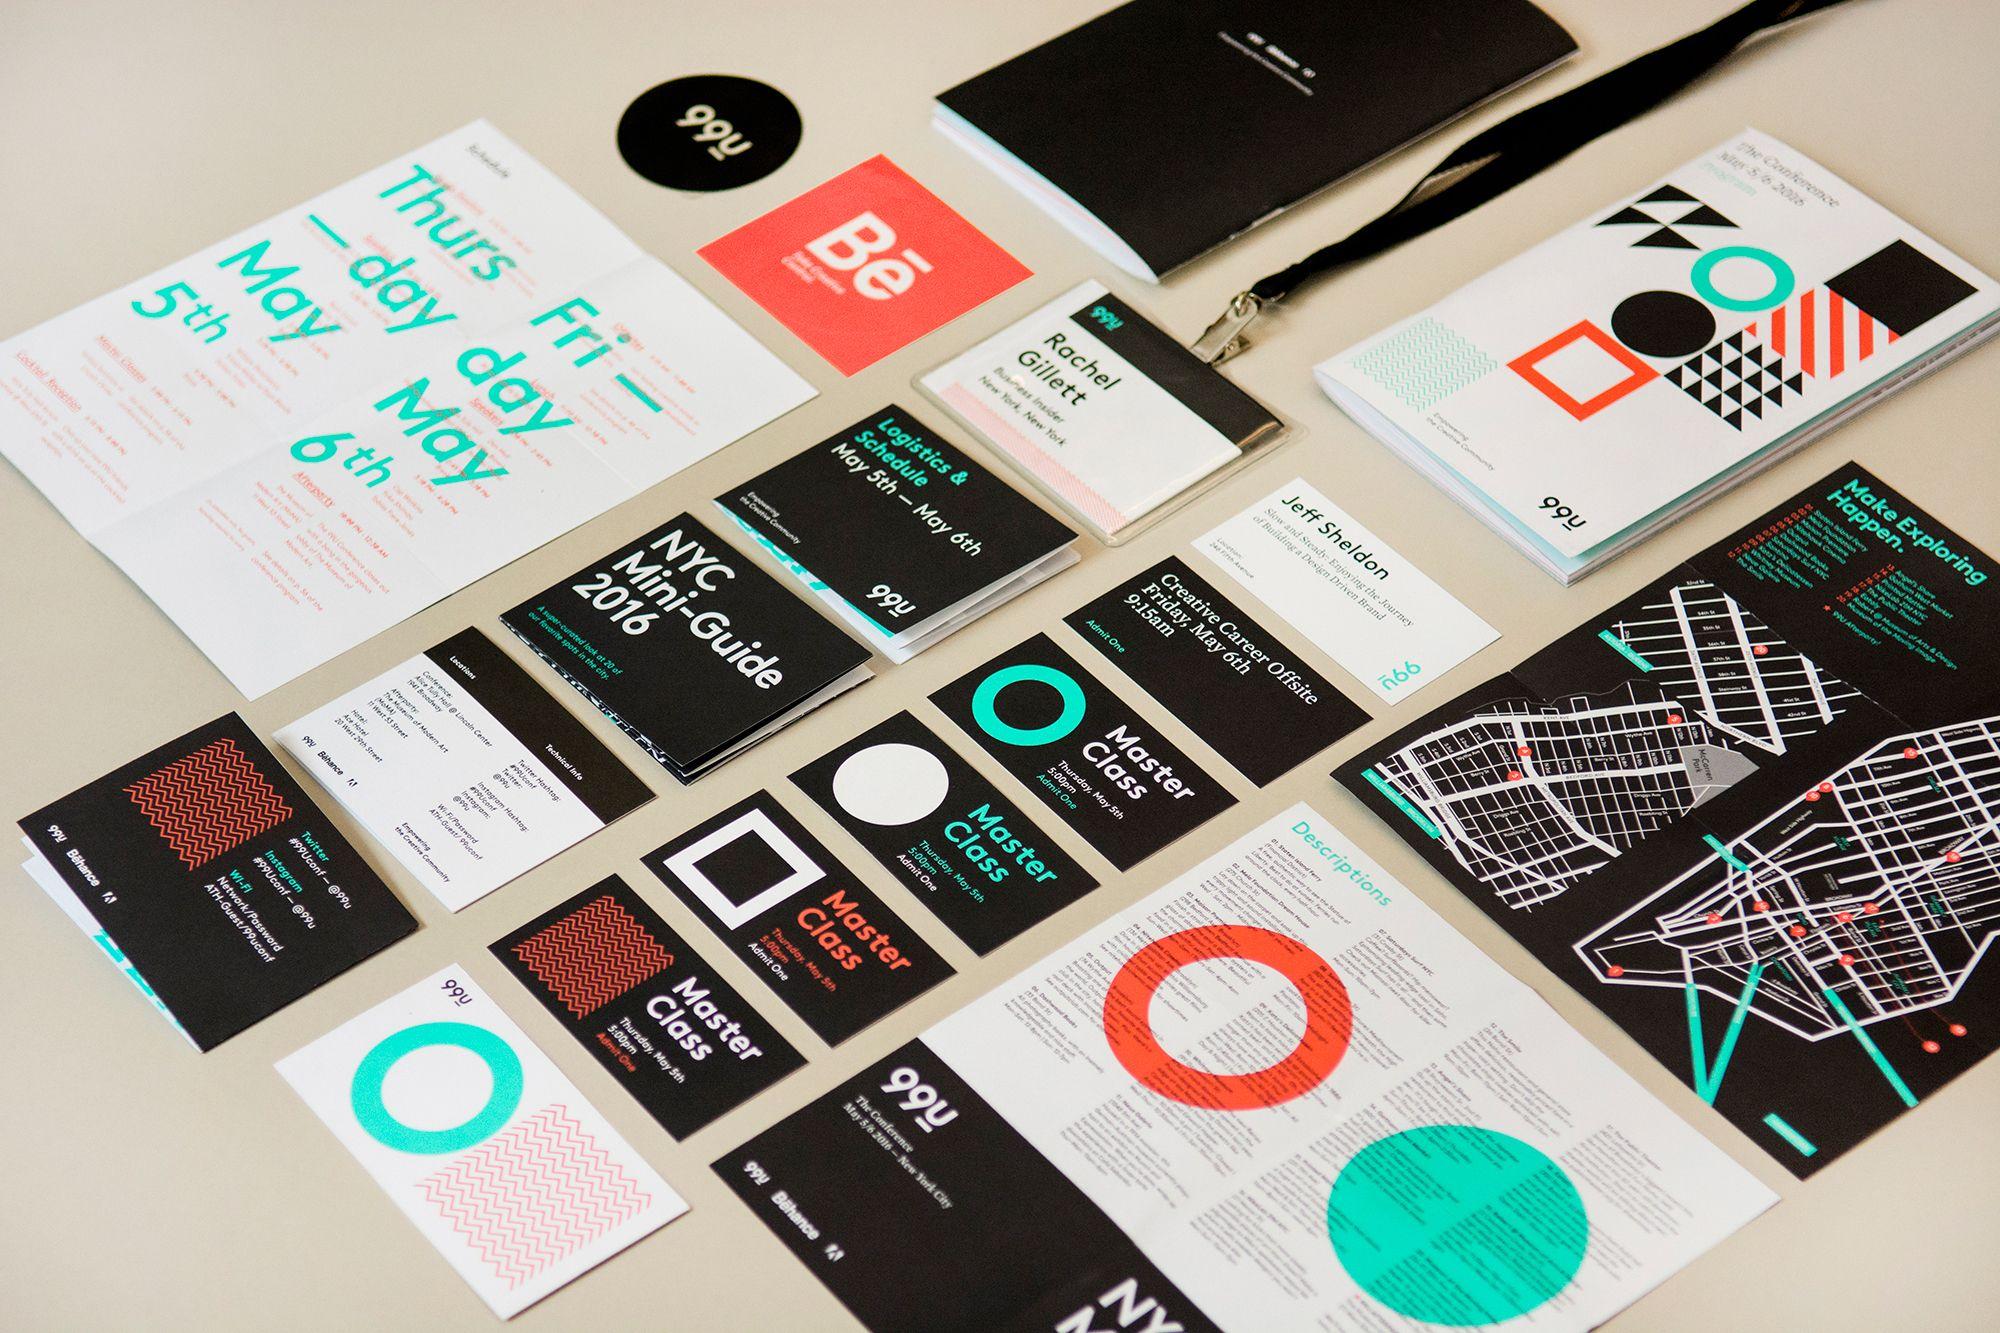 Key Elements Of Brand Identity Design Best Corporate Identity Examples Lucidpress Brand Identity Design Identity Design Corporate Identity Design